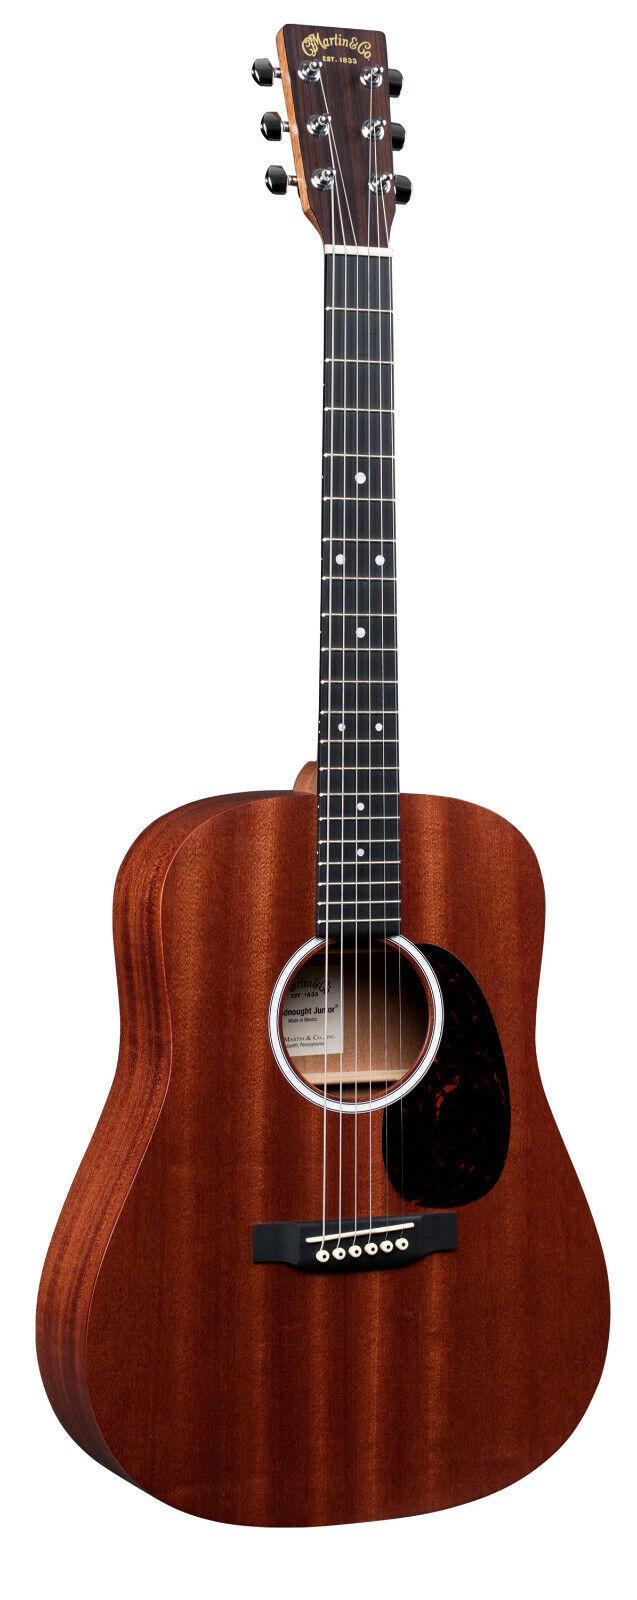 Martin DJR-10E Acoustic Electric Guitar Satin Natural Finish w  Soft Case Sapele